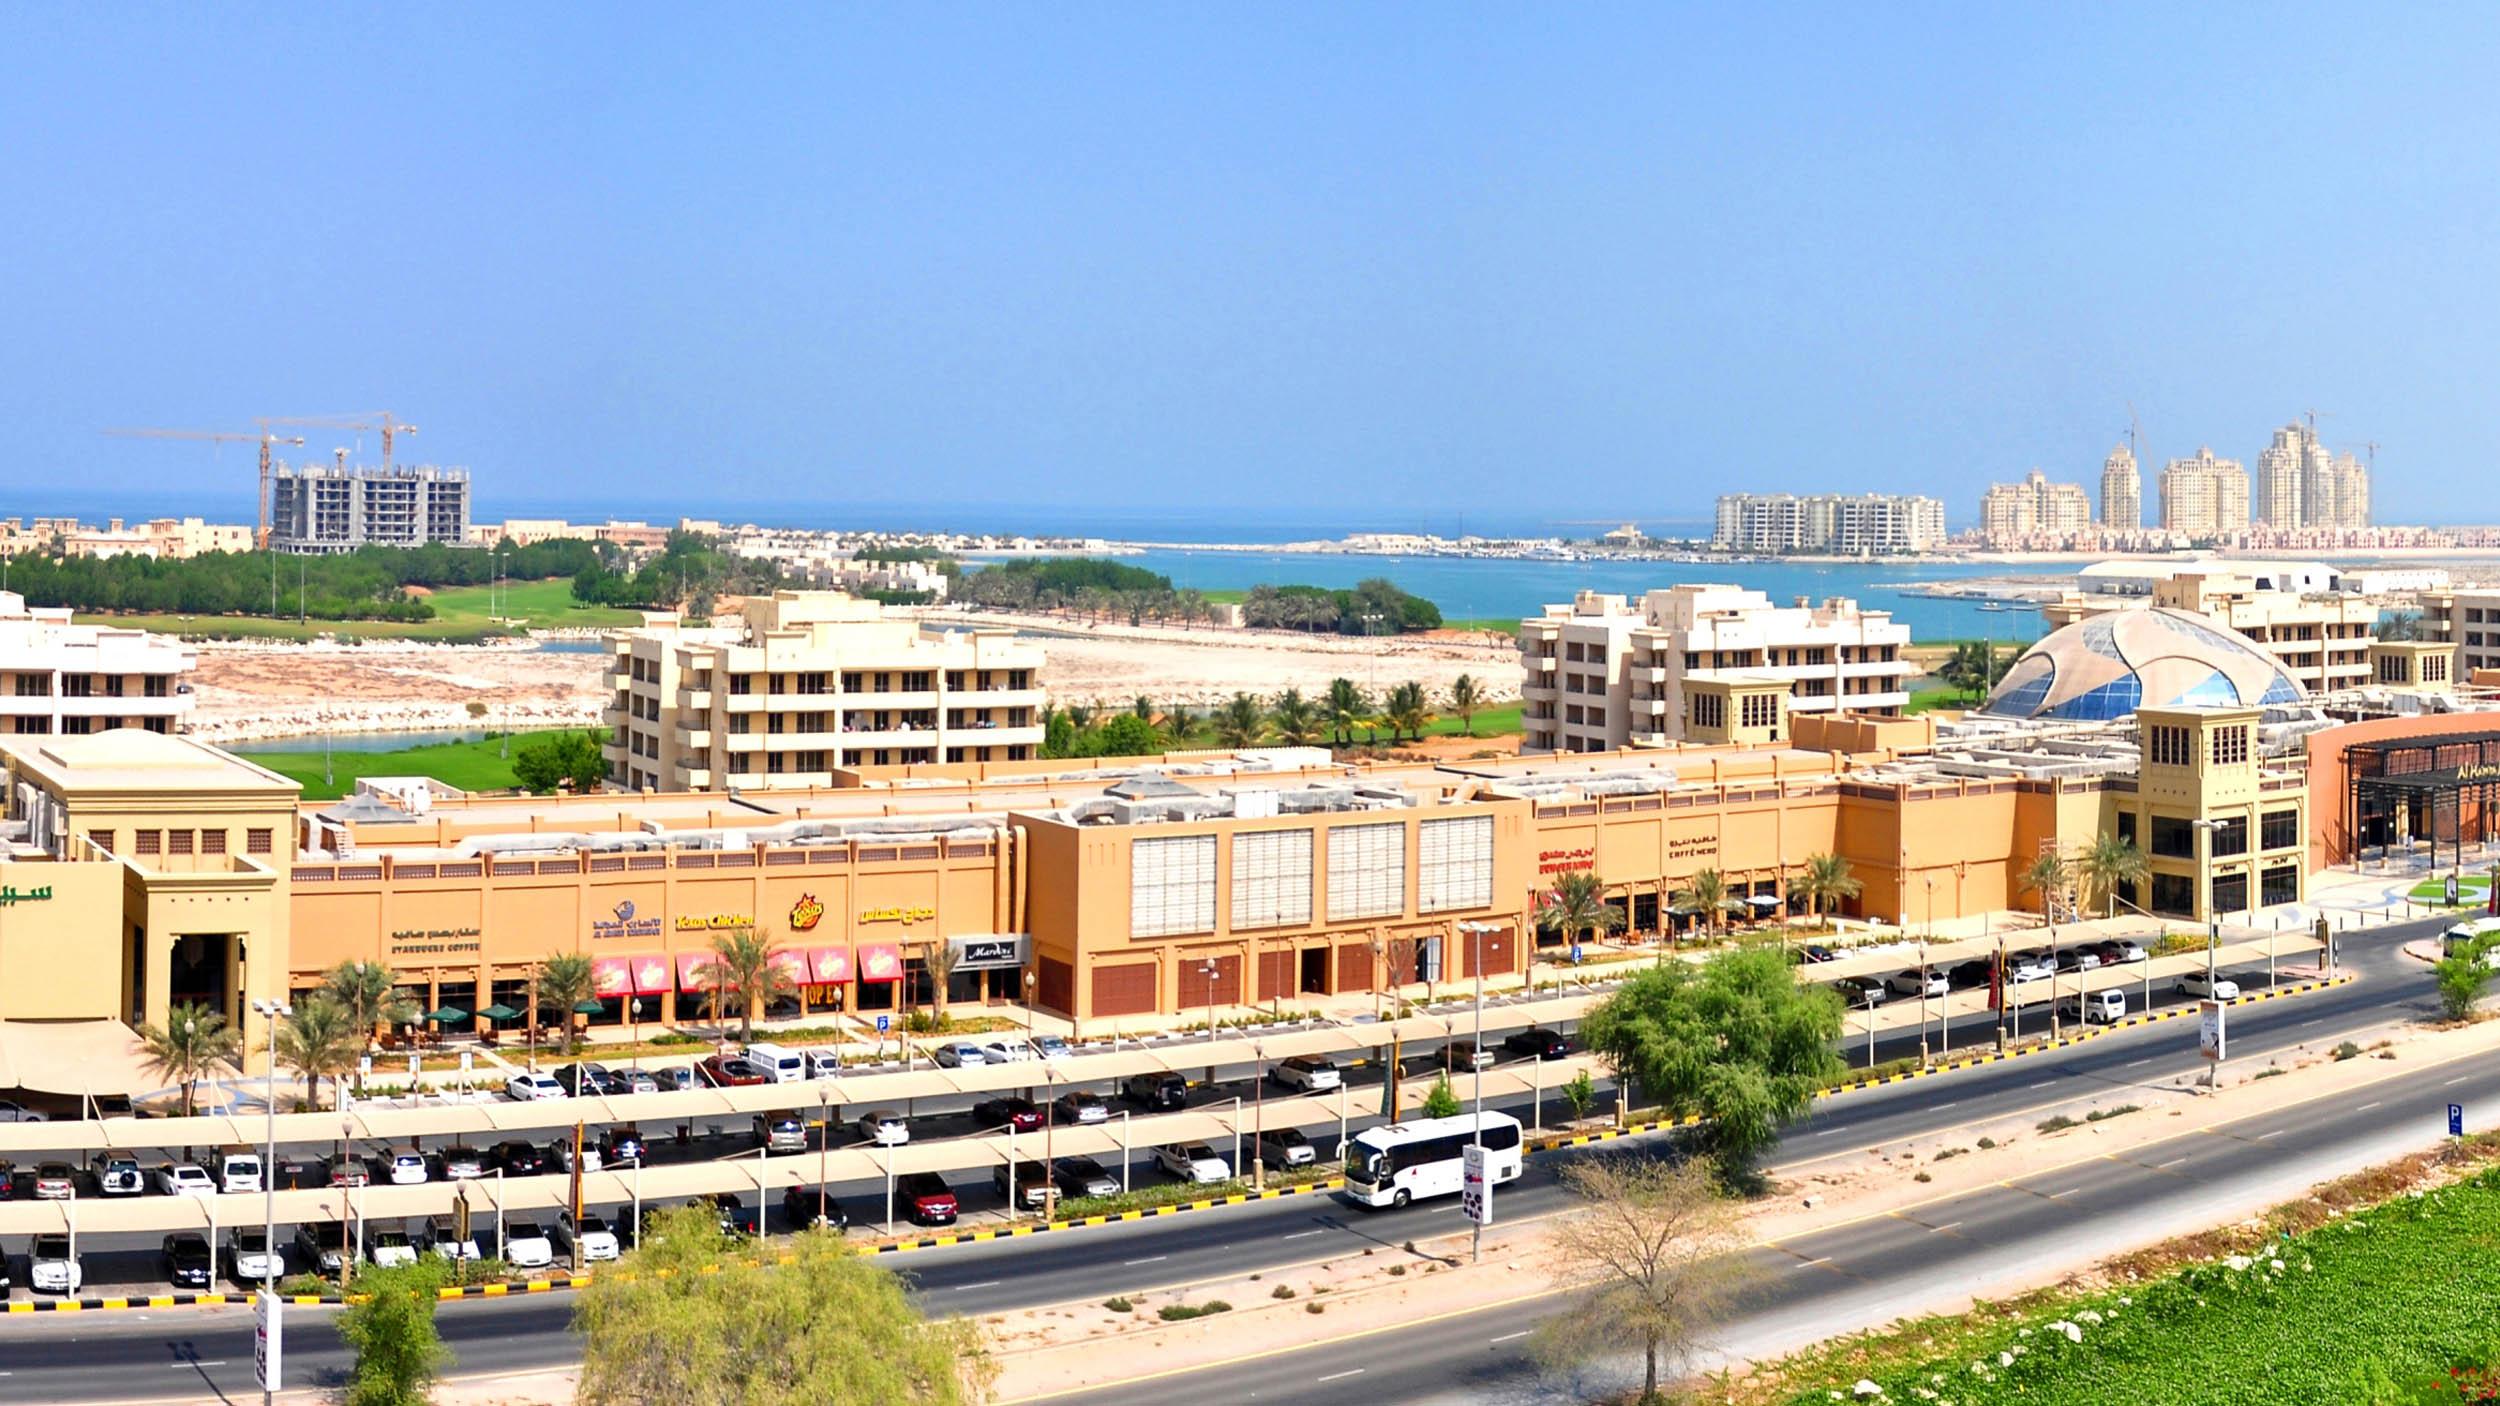 AL HAMRA MALL - Ras Al Khaimah, UAE